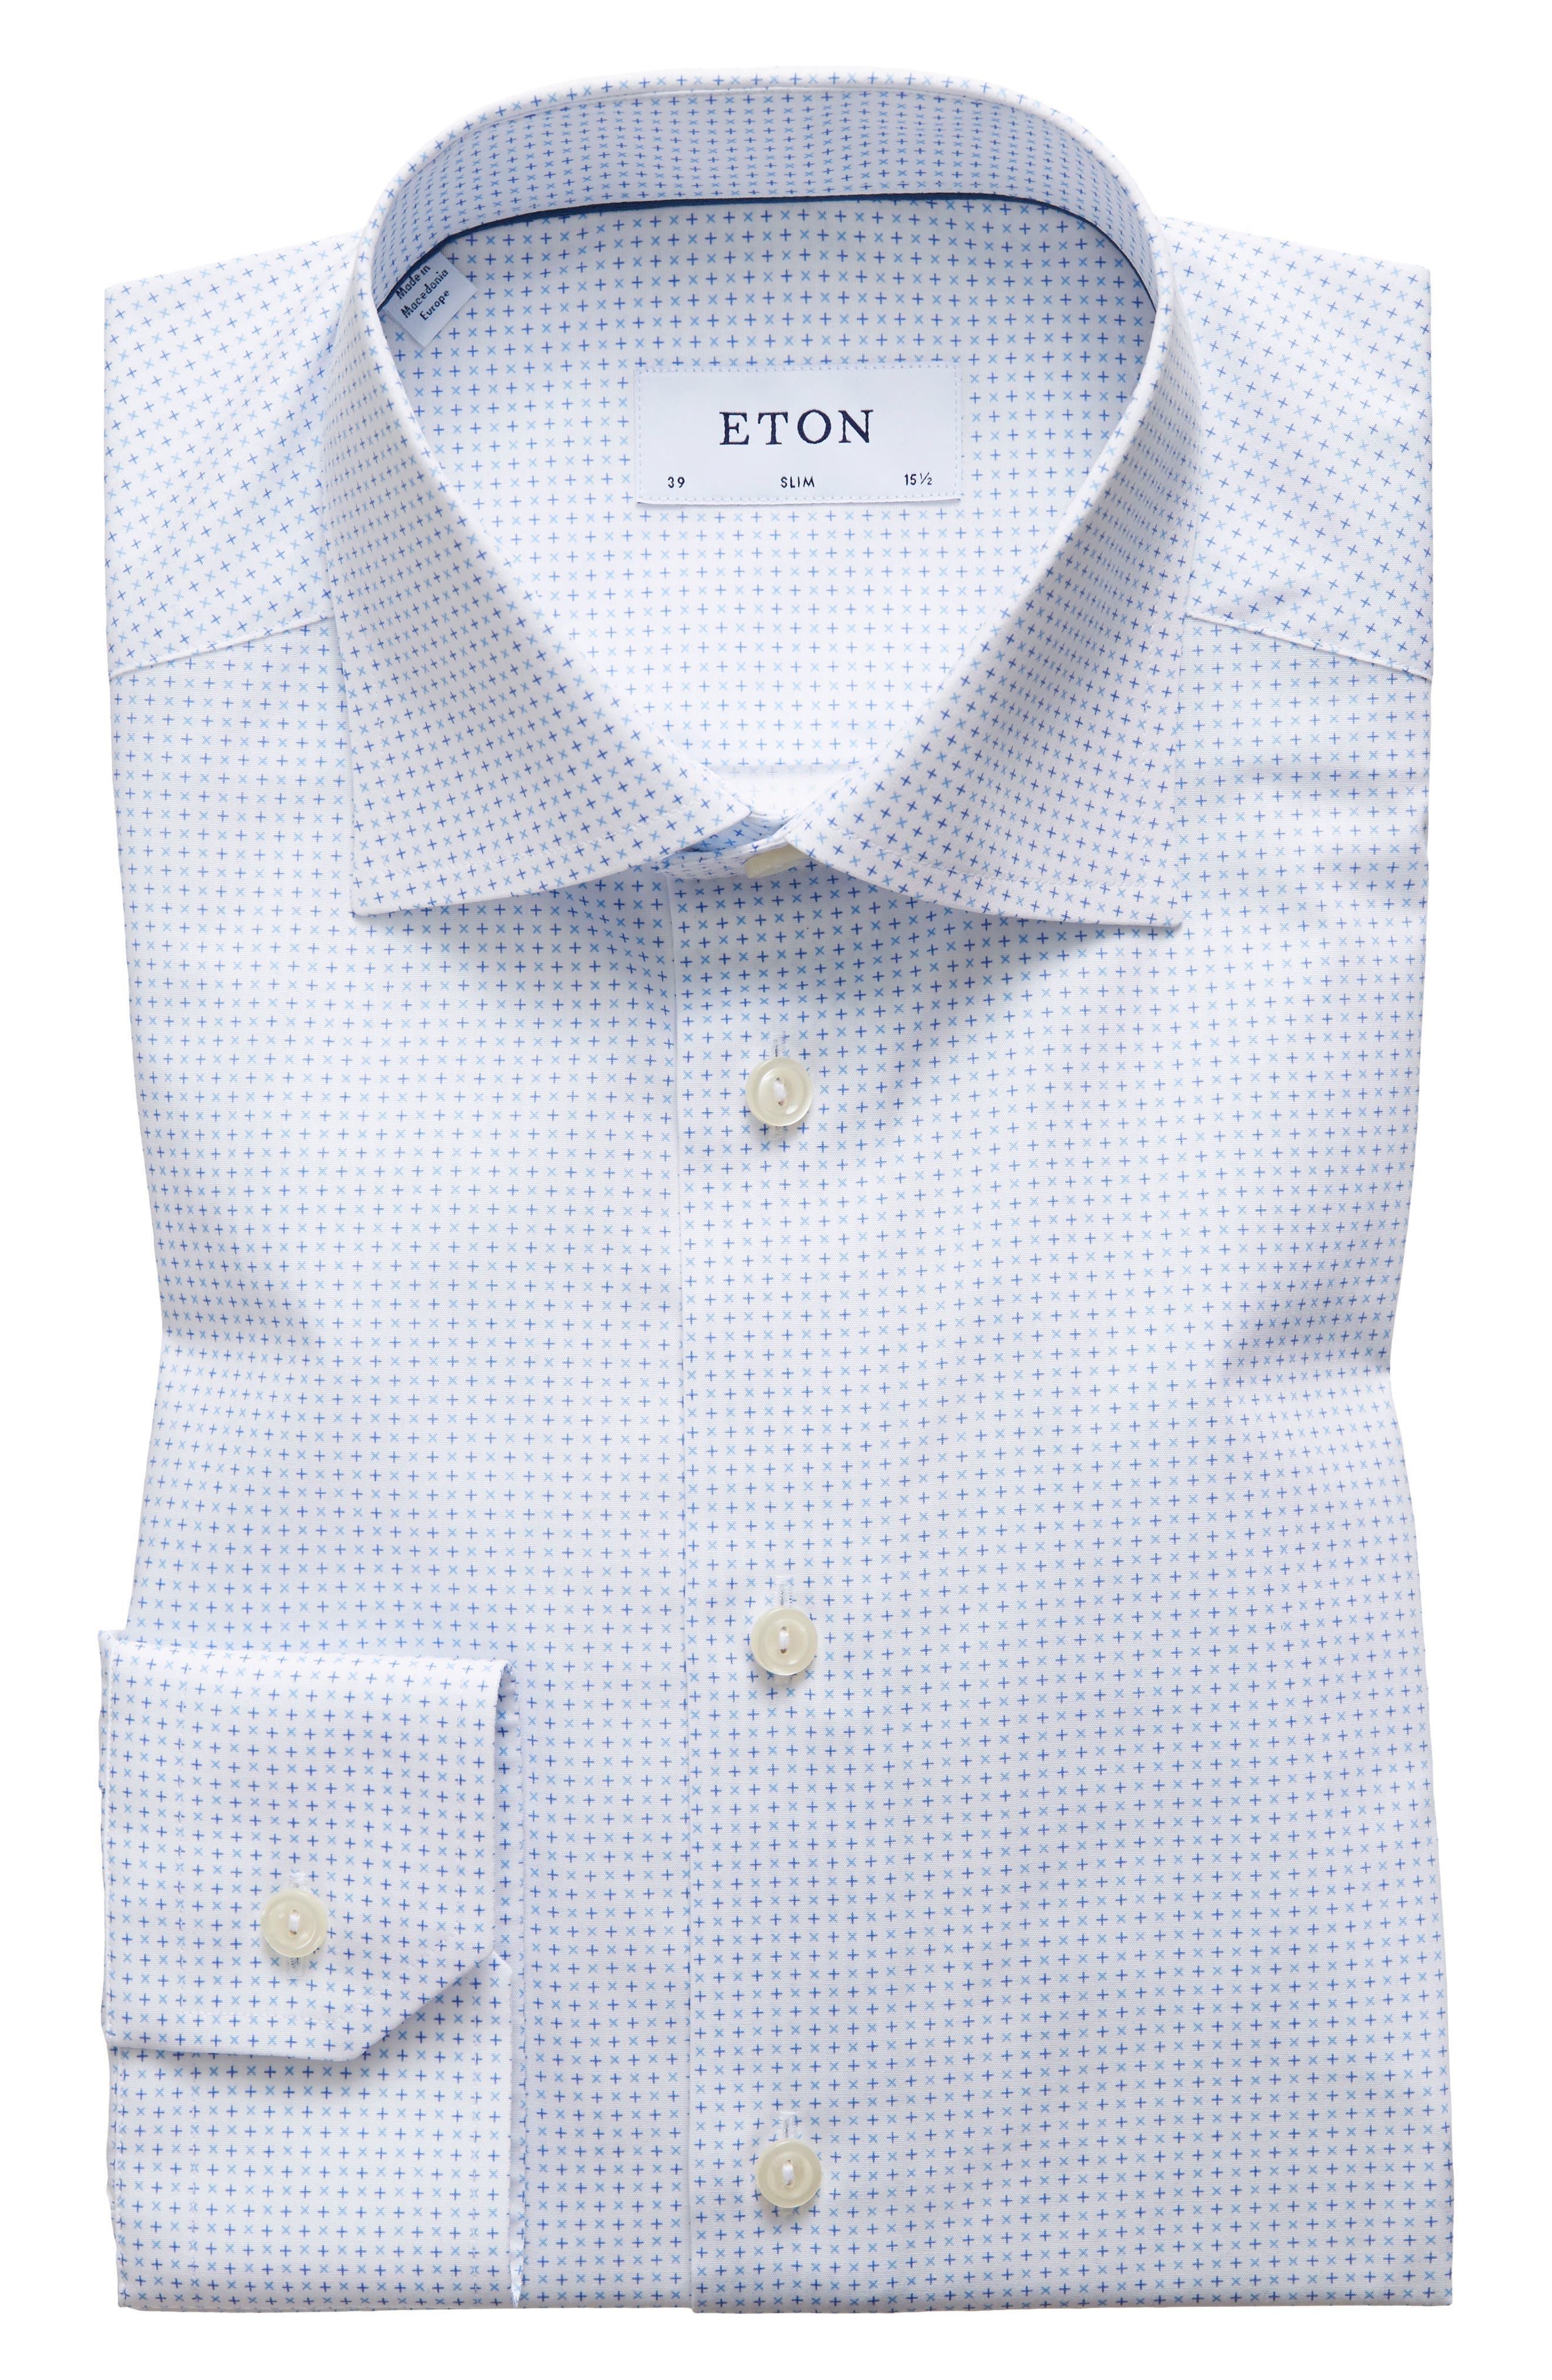 Eton Slim Fit Cross Print Dress Shirt